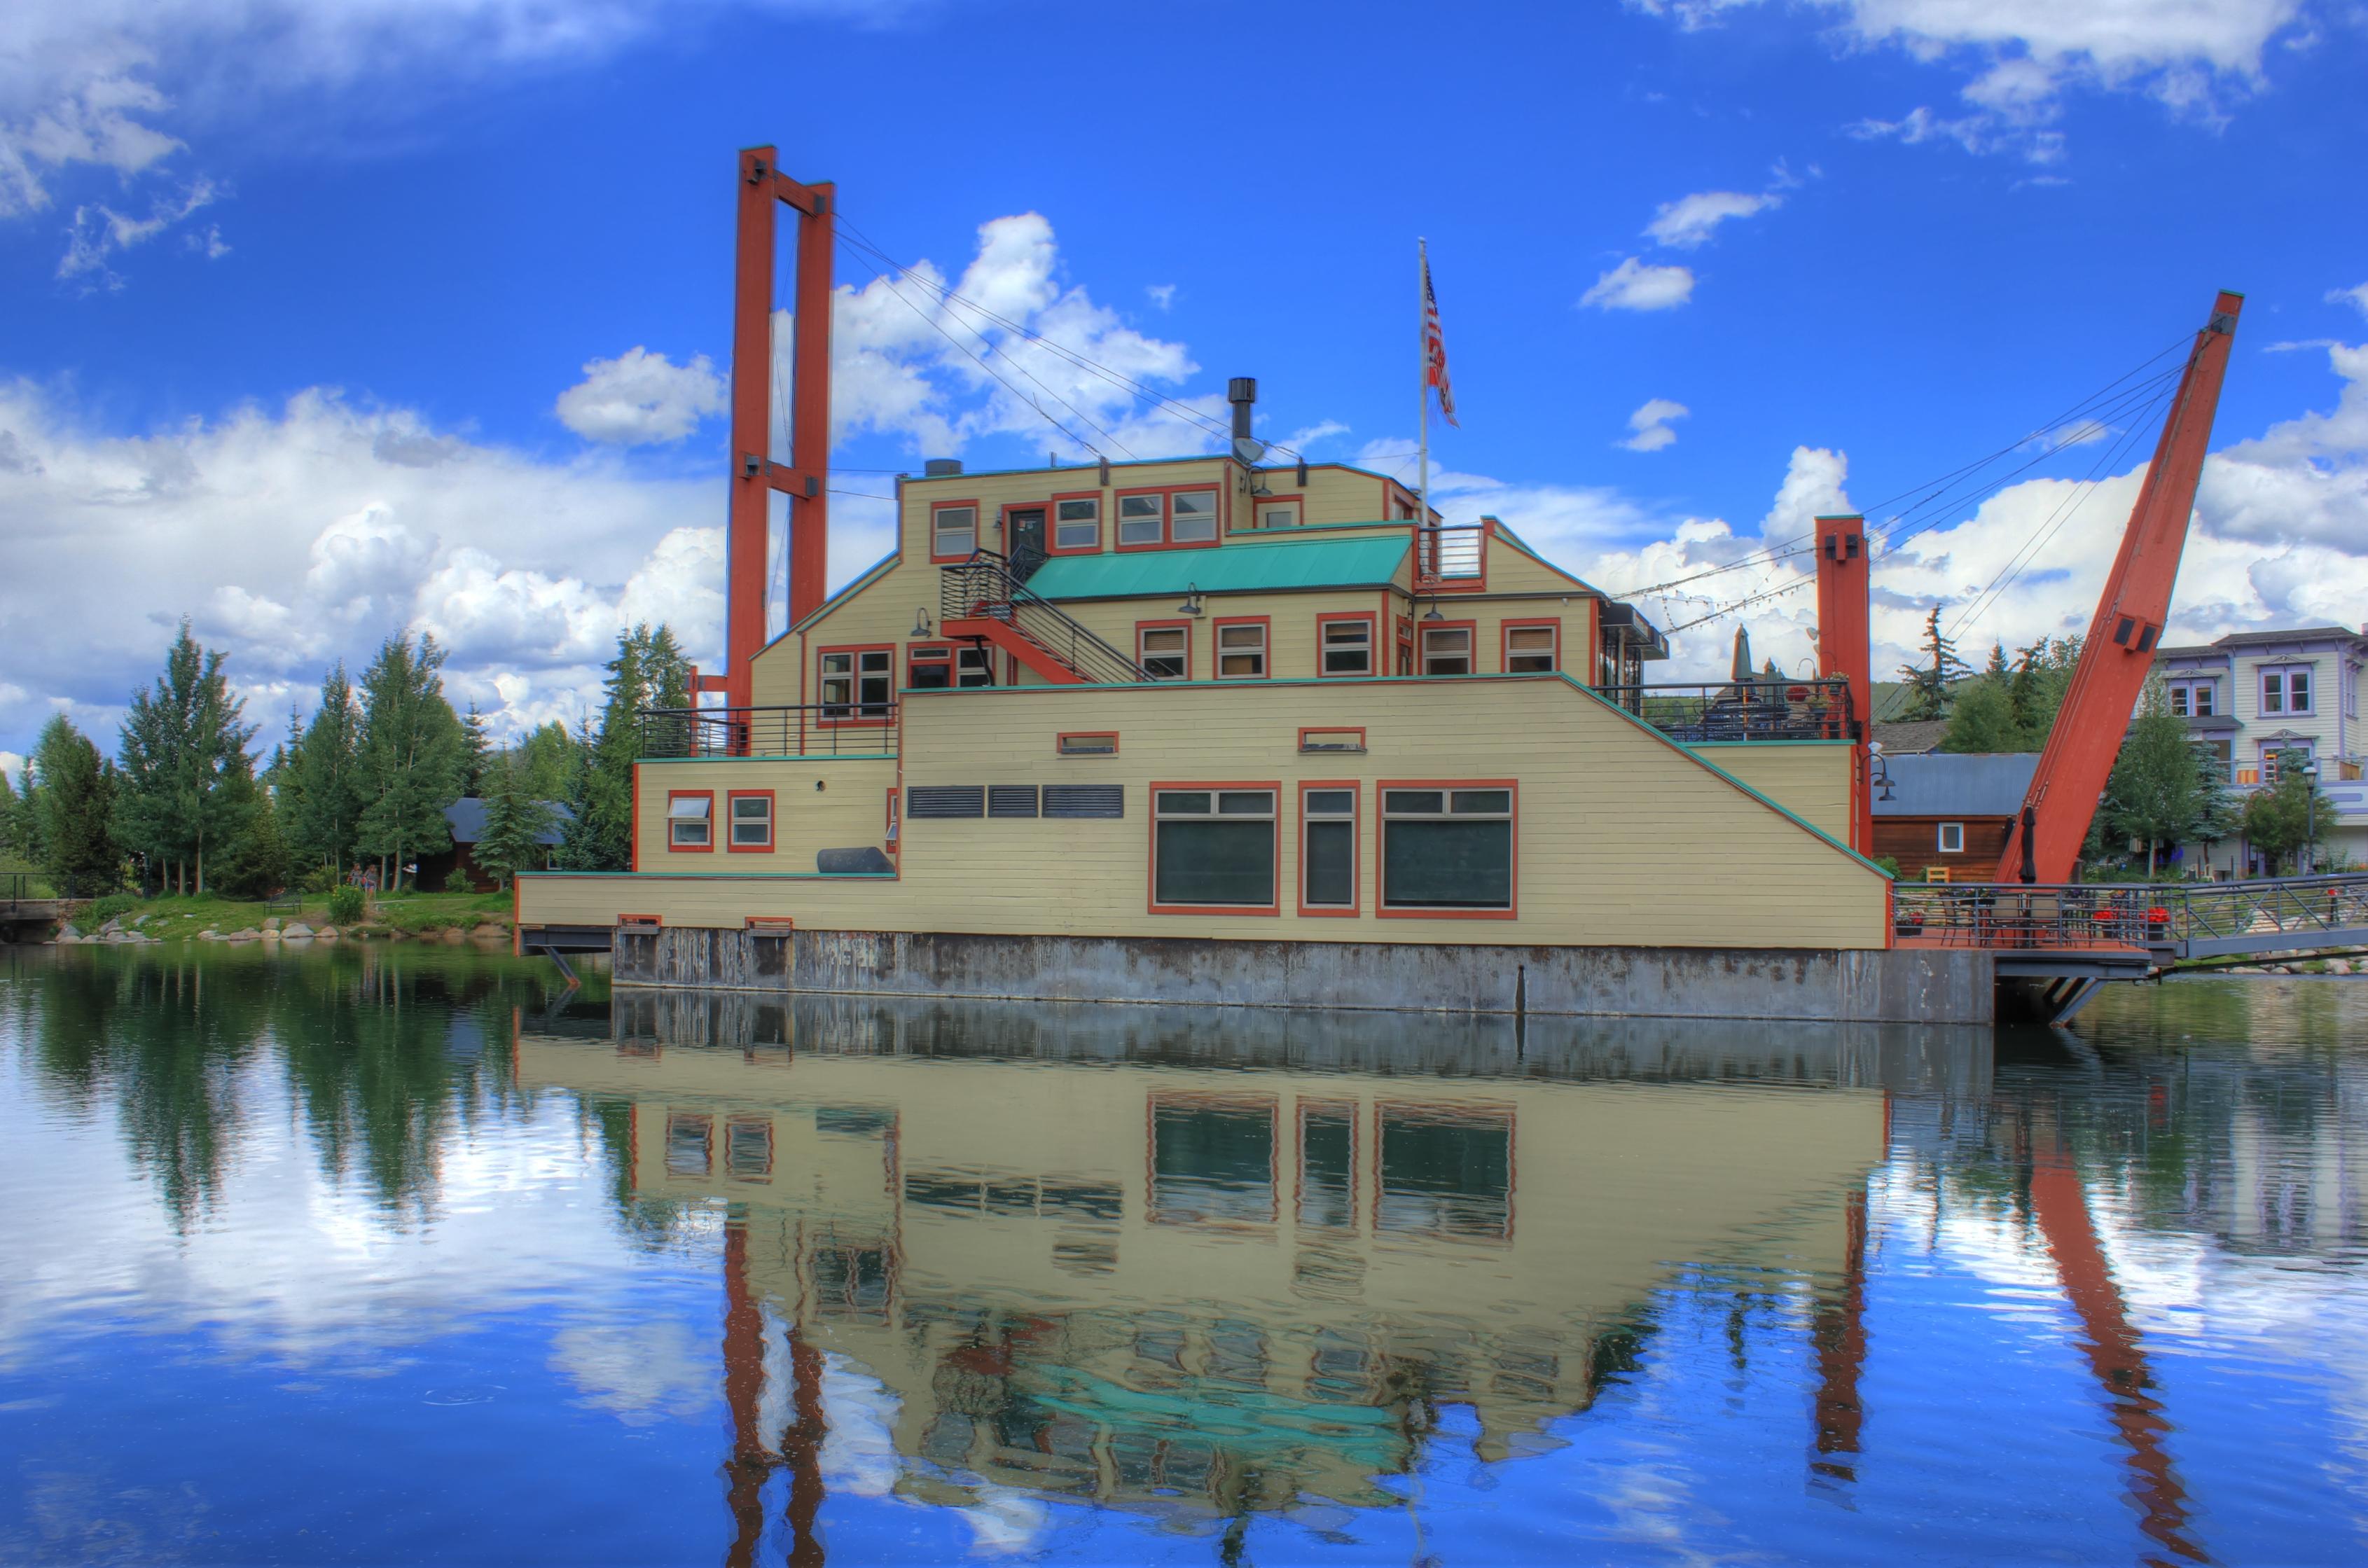 Floating Restaurant At Breckenridge Colorado Image Free